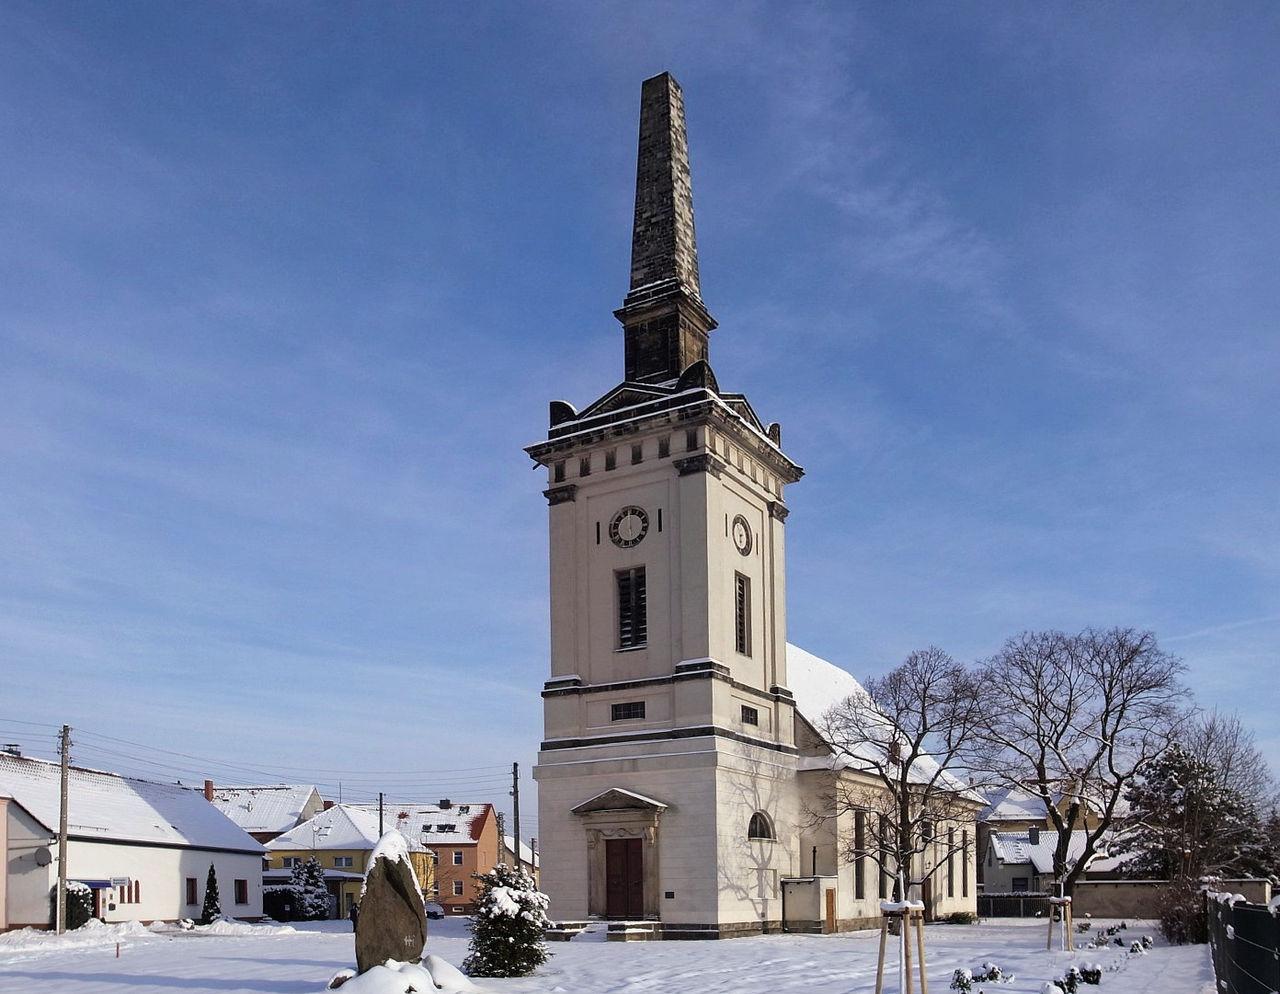 Bild Kirche St. Bartholomäi Dessau